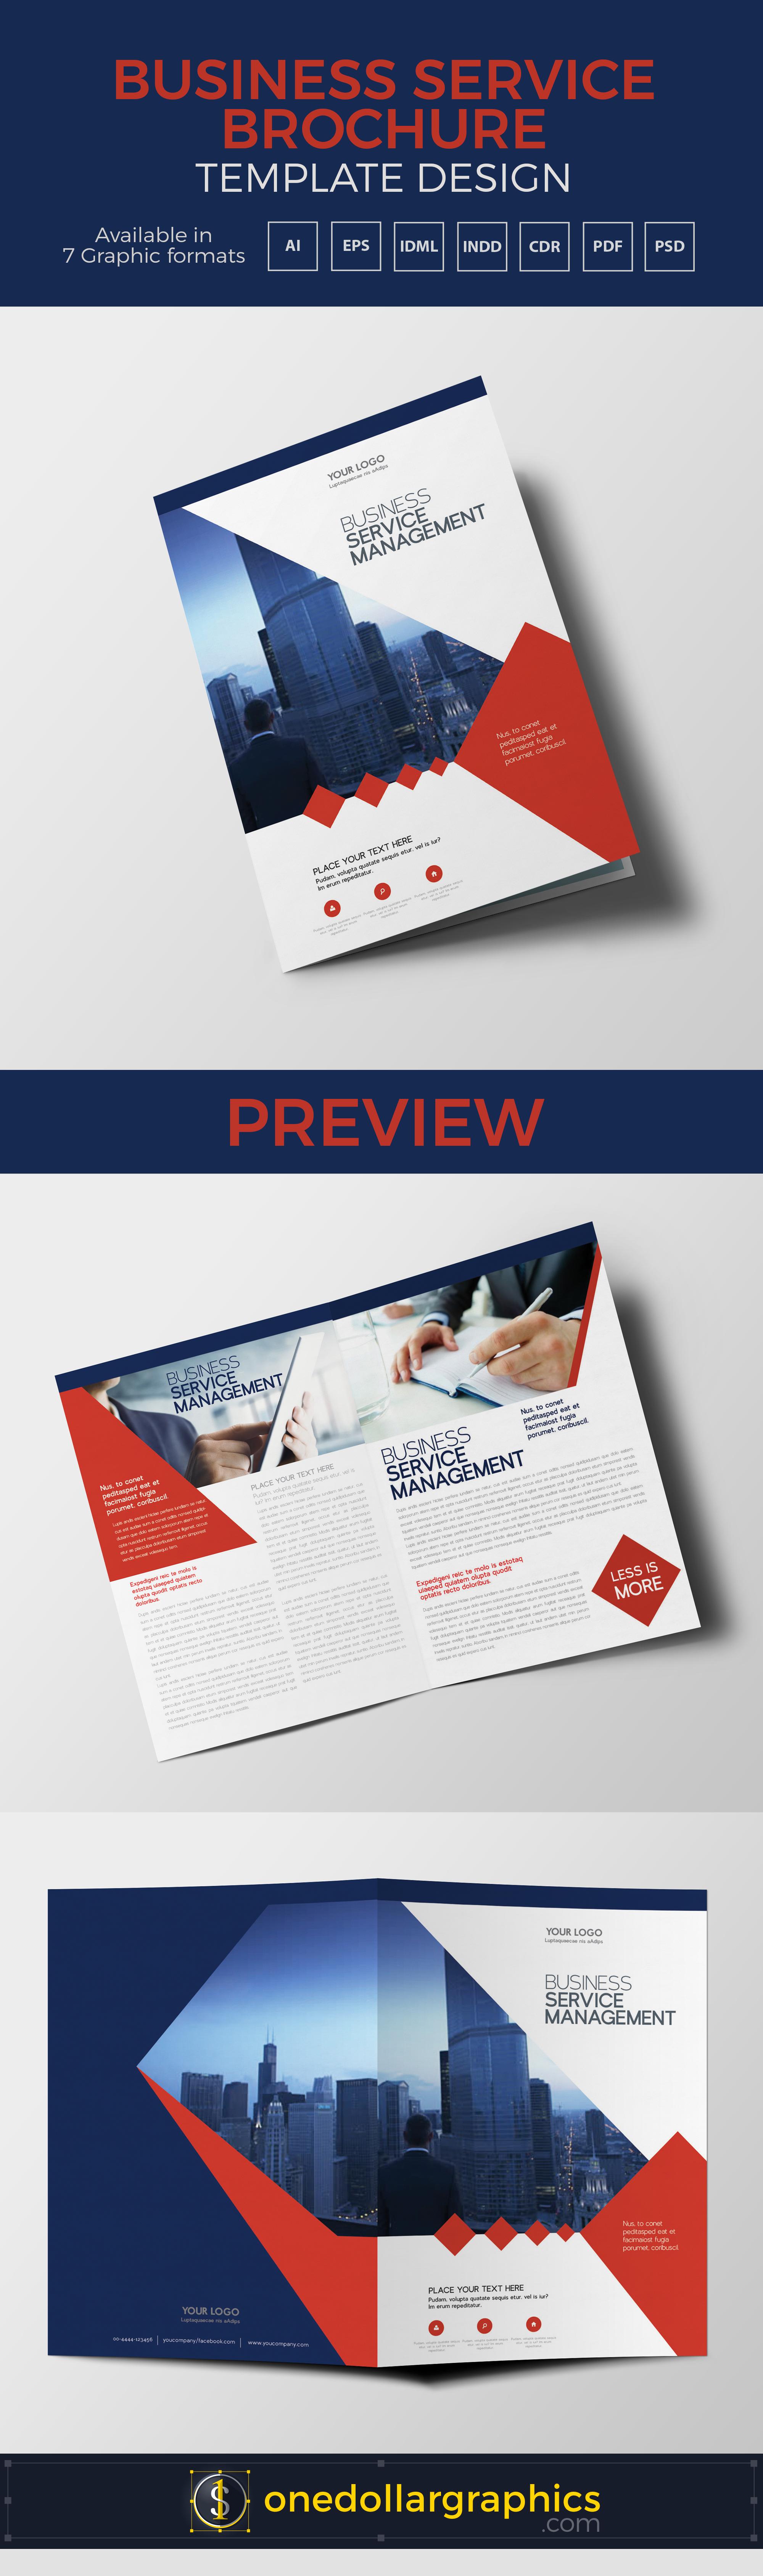 BiFold-Business-Brochure-Template-Design